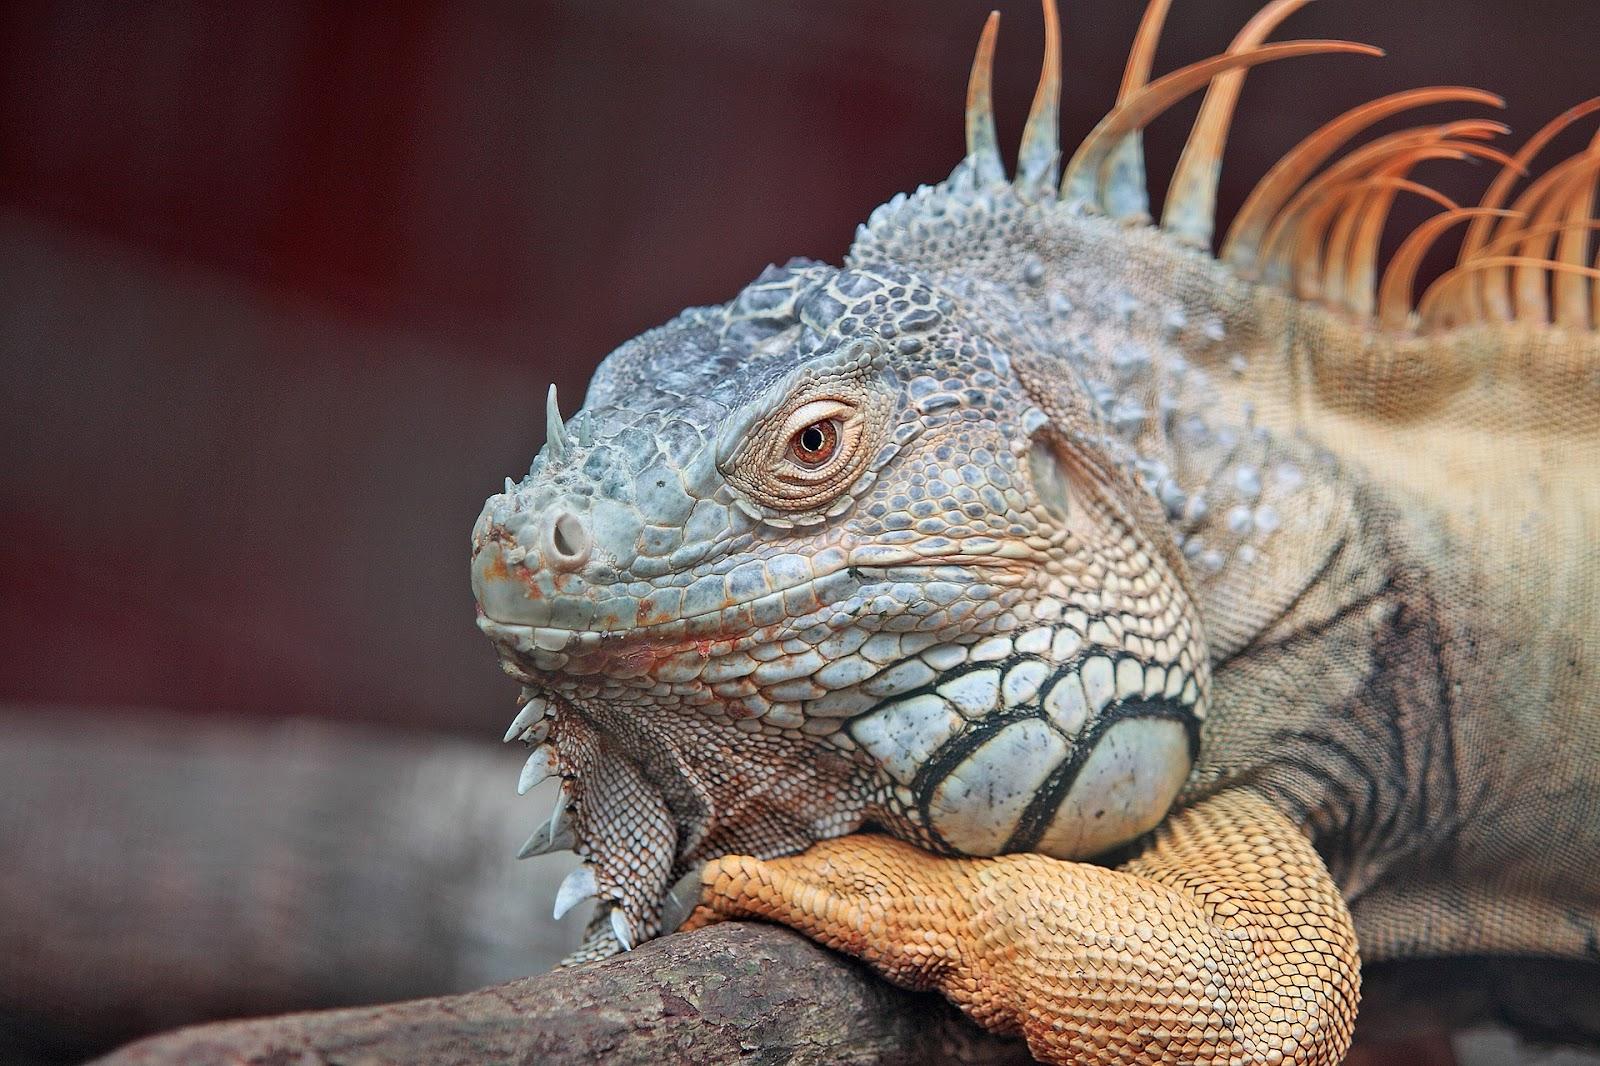 Iguana on branch